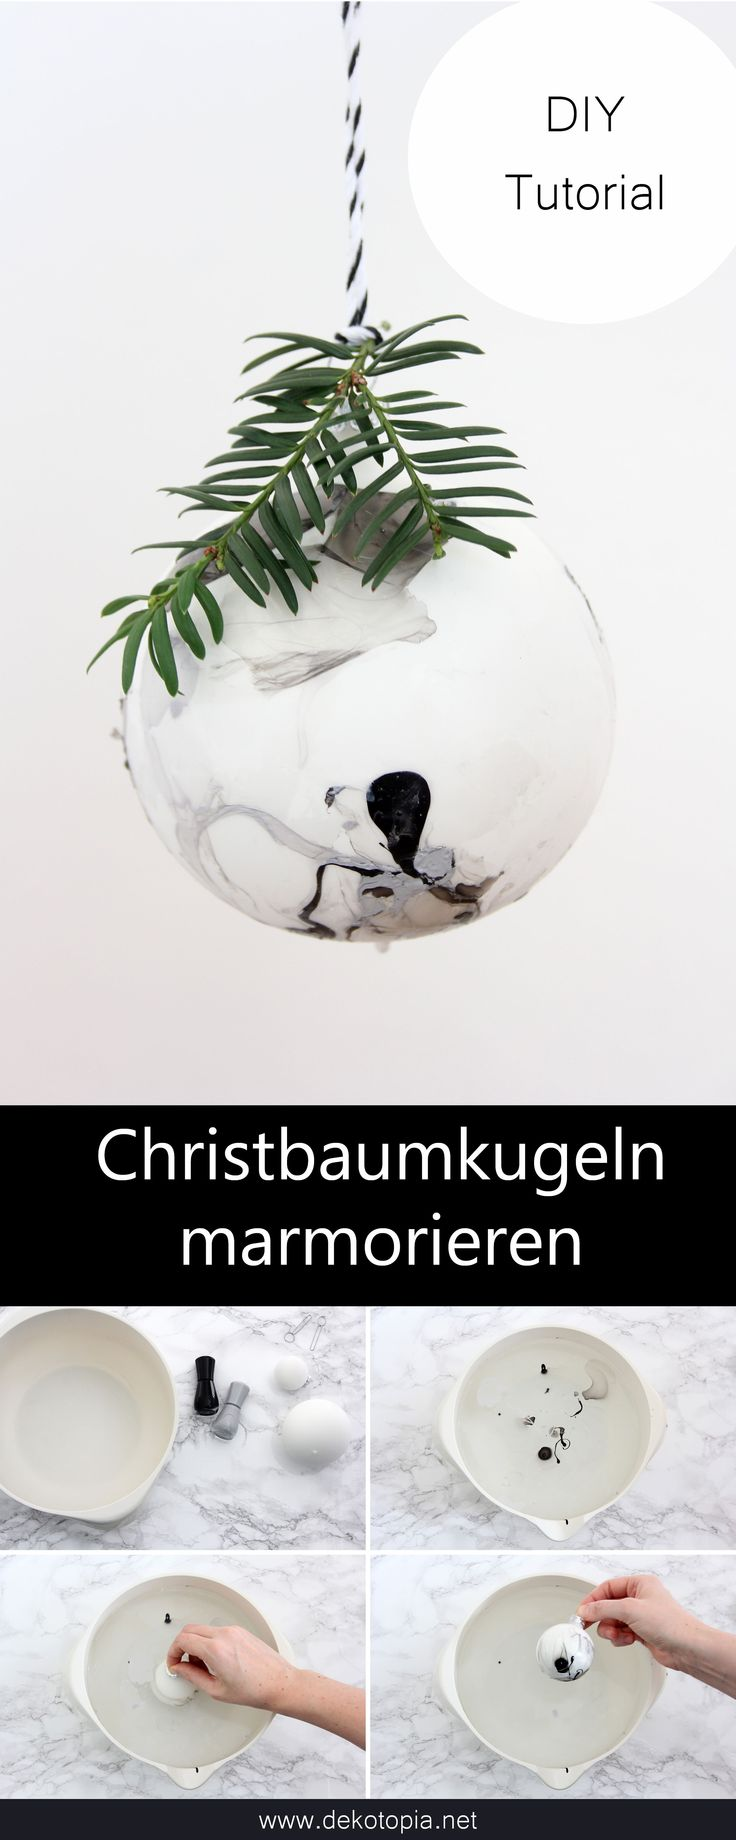 DIY Anleitung: Christbaumkugeln mit Nagellack kugeln